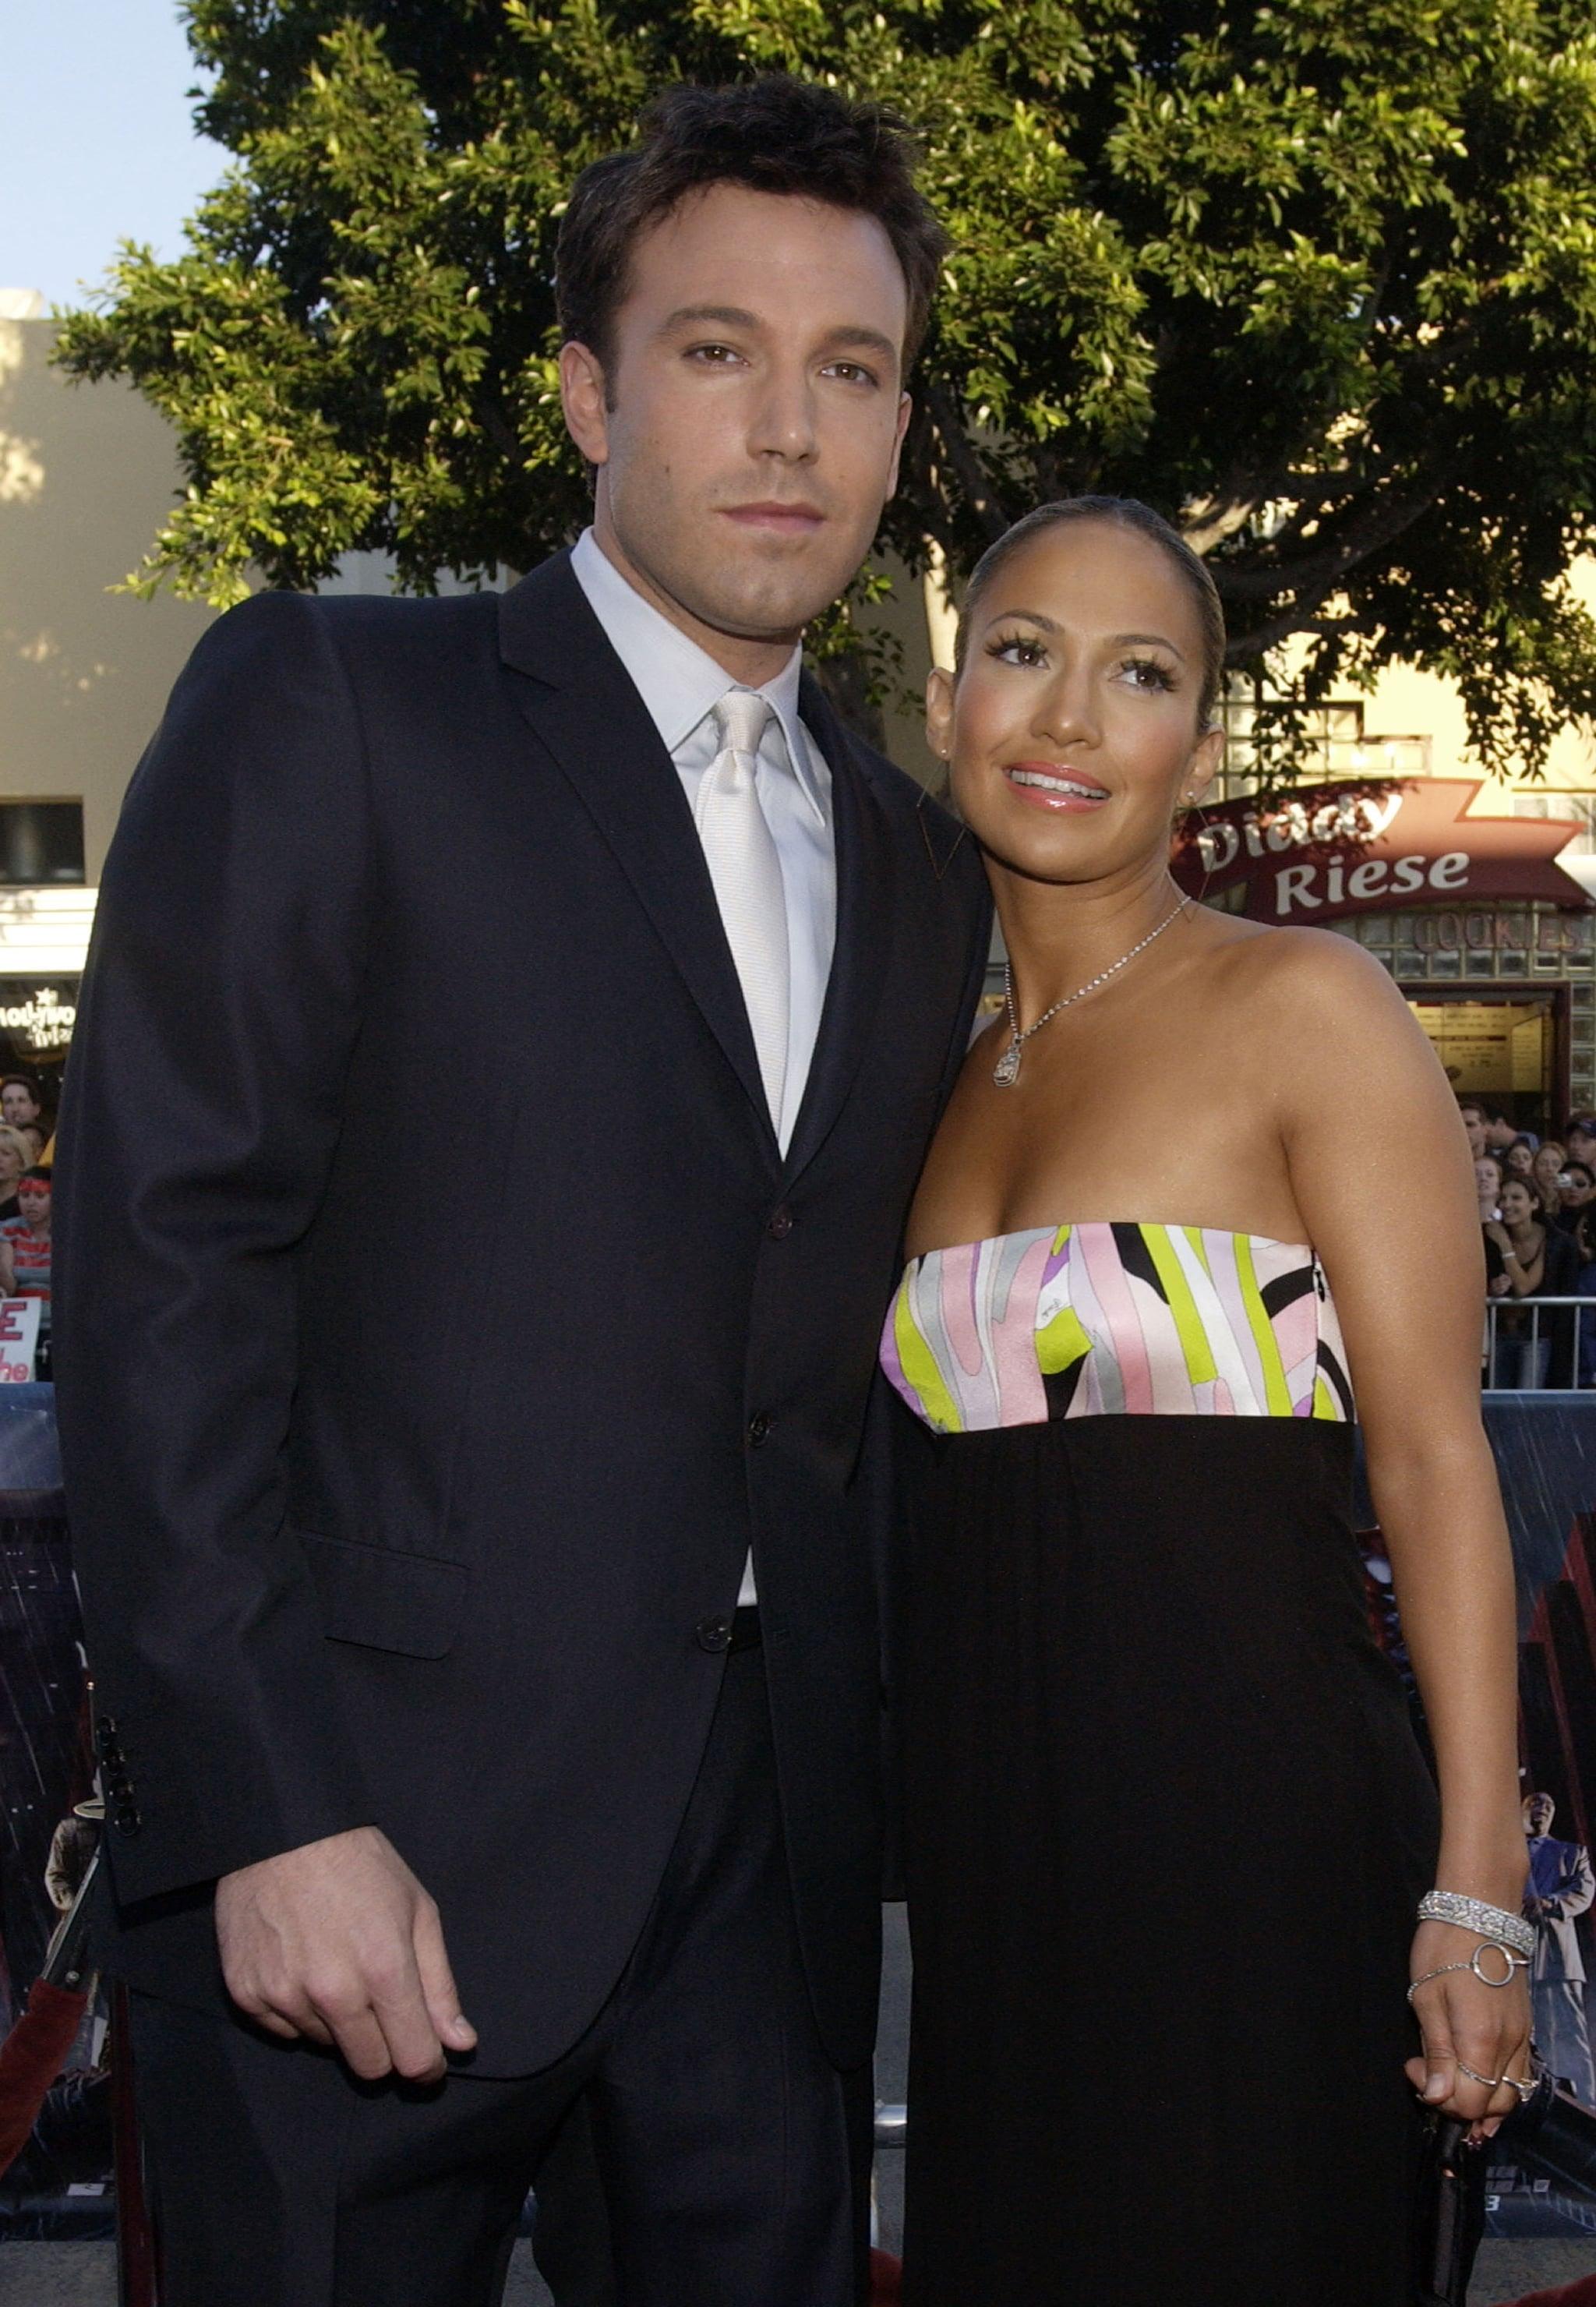 Ben Affleck & Jennifer Lopez during Daredevil Premiere - Arrivals at Mann Village Theatre in Westwood, CA, United States. (Photo by Chris Weeks/FilmMagic)